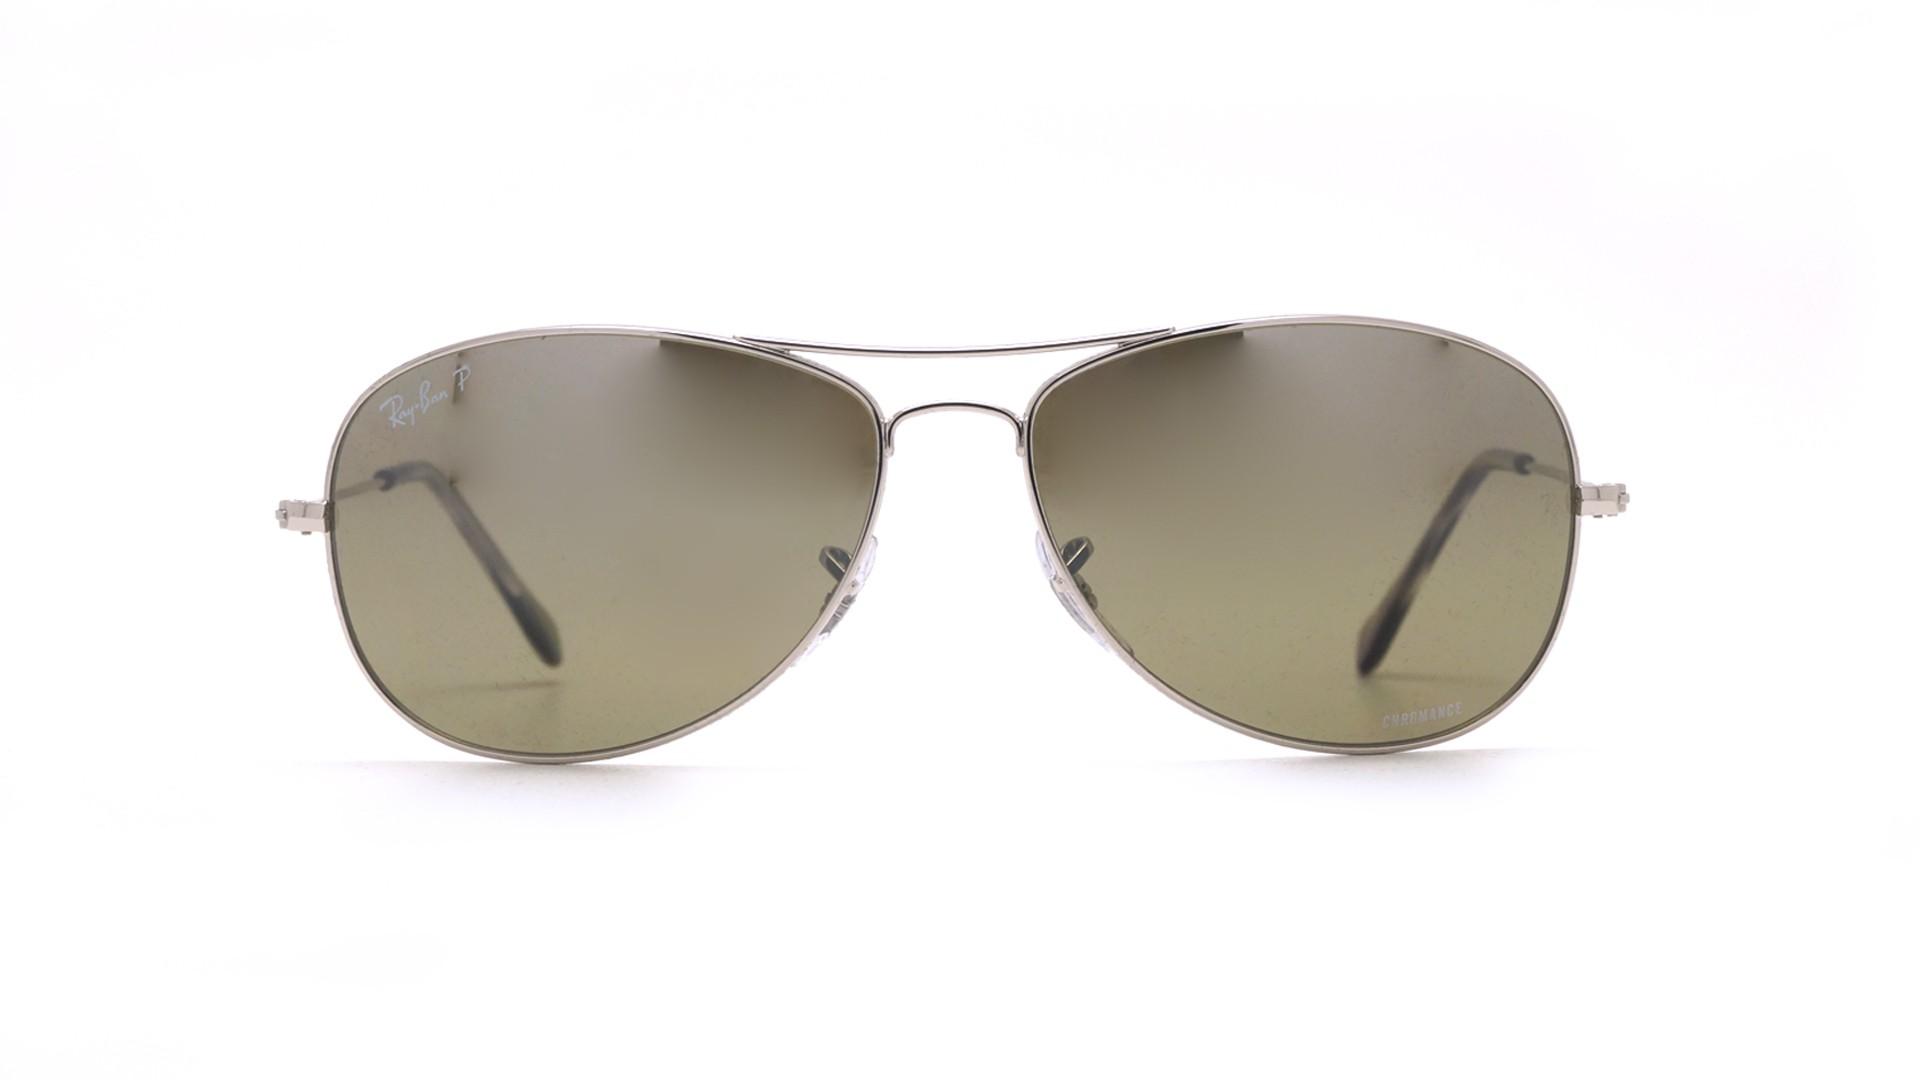 e4391c0cdaf Sunglasses Ray-Ban RB3562 003 5J 59-14 Silver Chromance Medium Polarized  Gradient Mirror